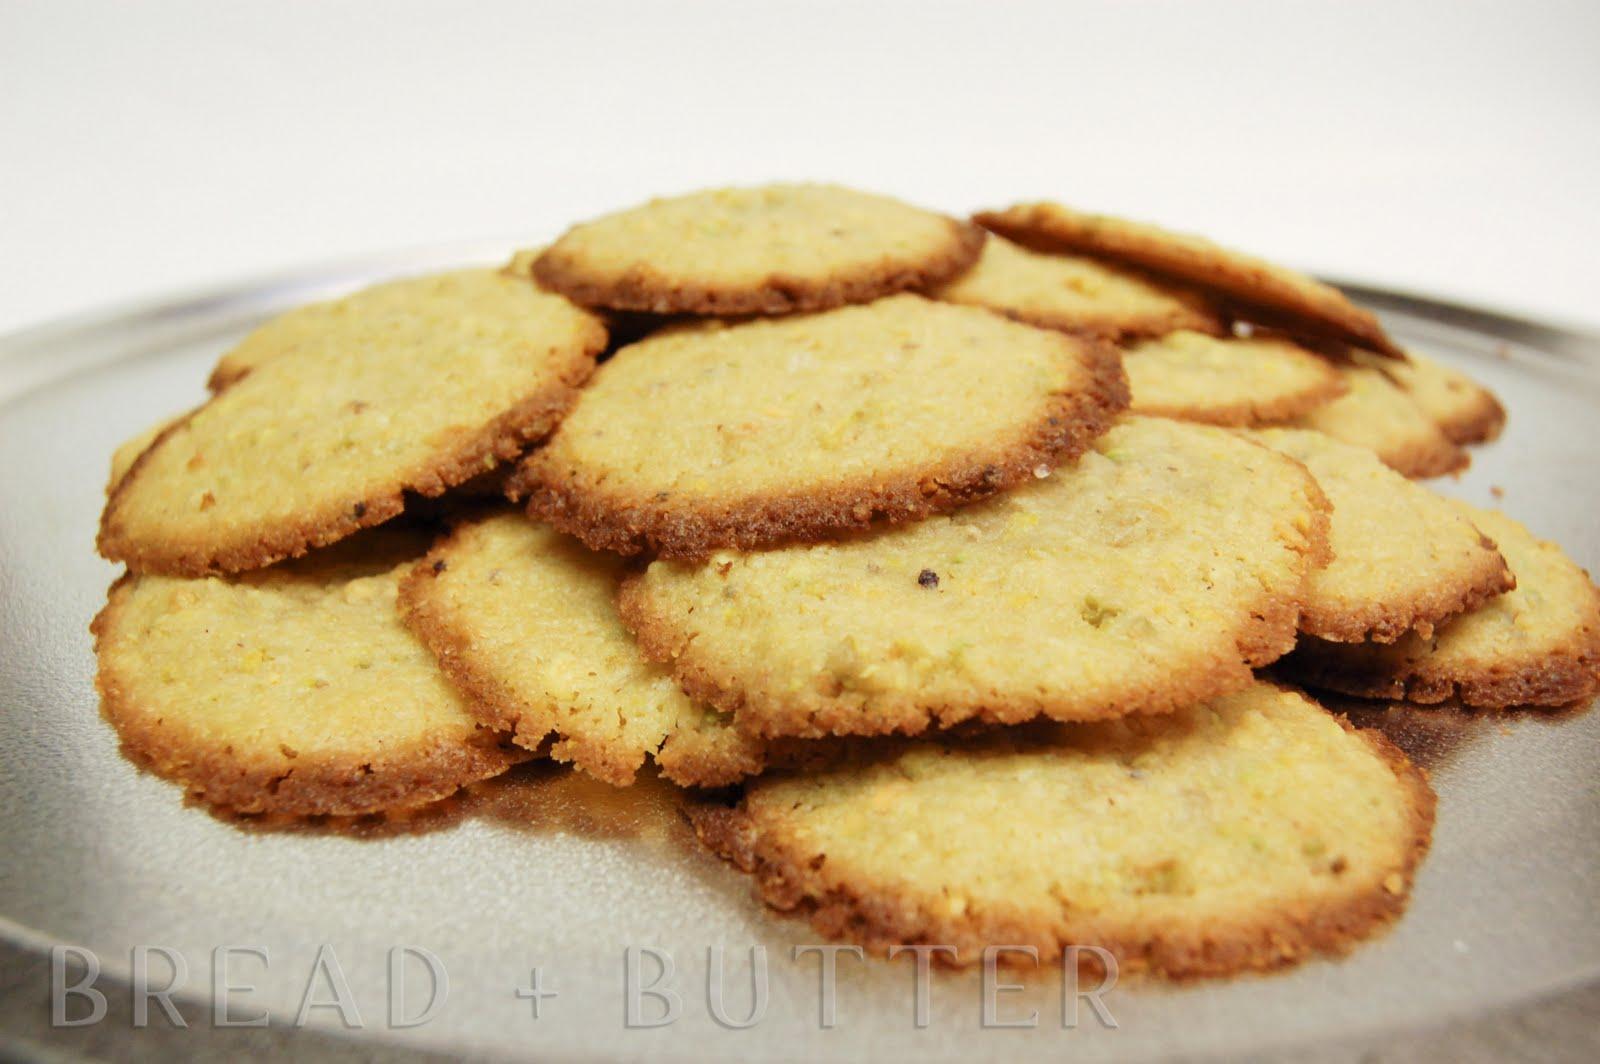 Bread + Butter: Lemon and Pistachio Cookies